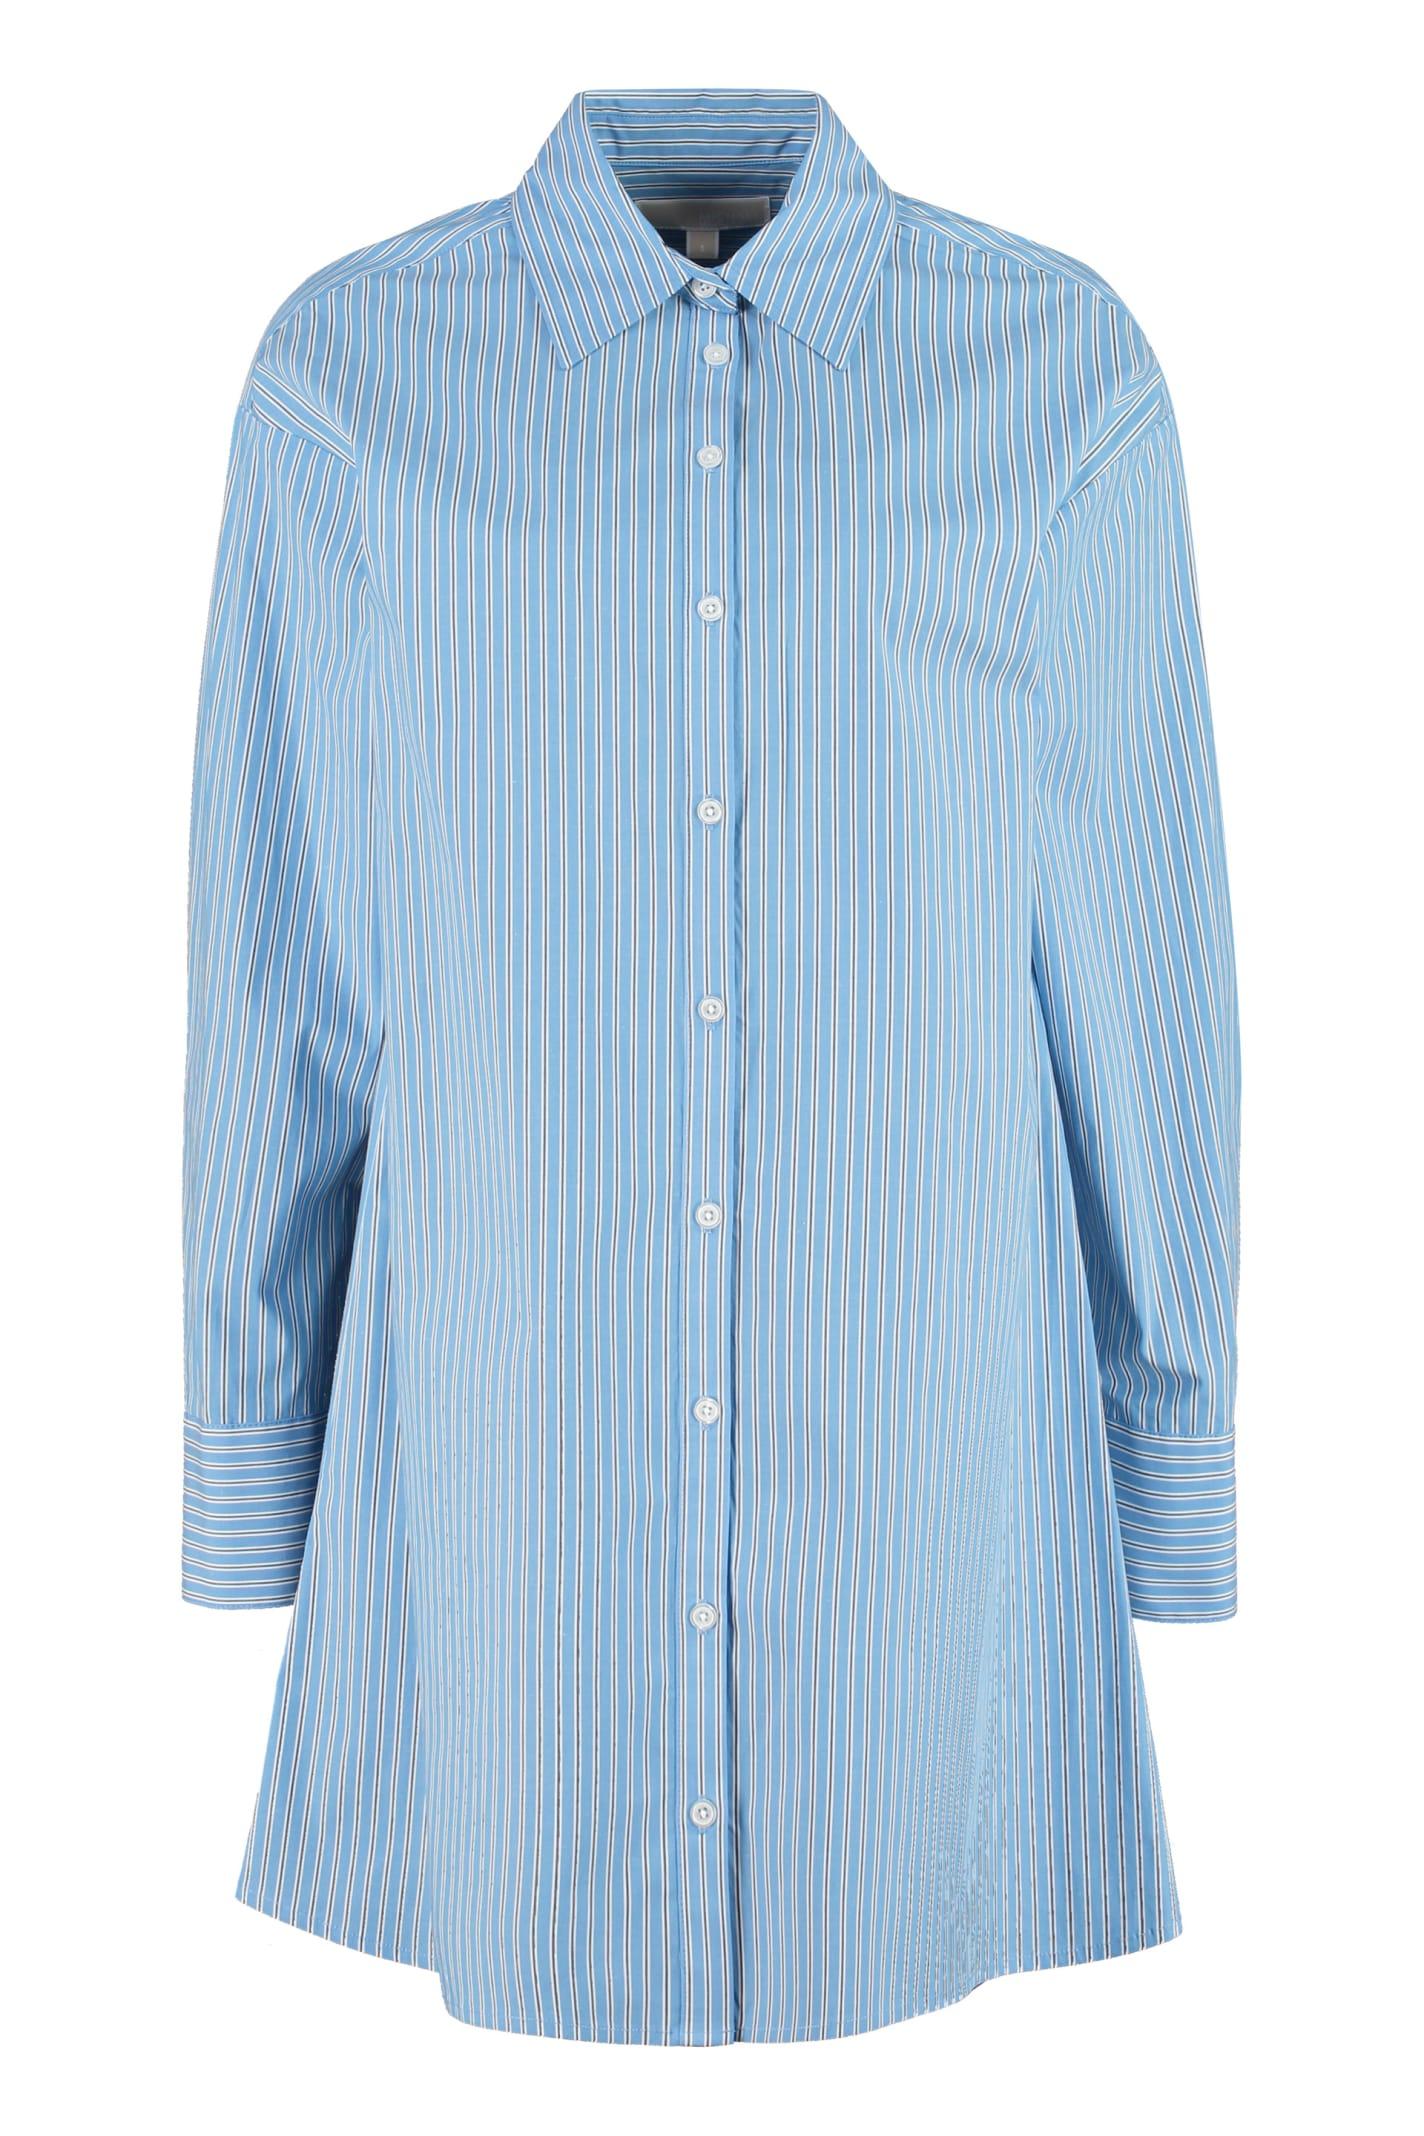 Buy MICHAEL Michael Kors Striped Poplin Shirtdress online, shop MICHAEL Michael Kors with free shipping